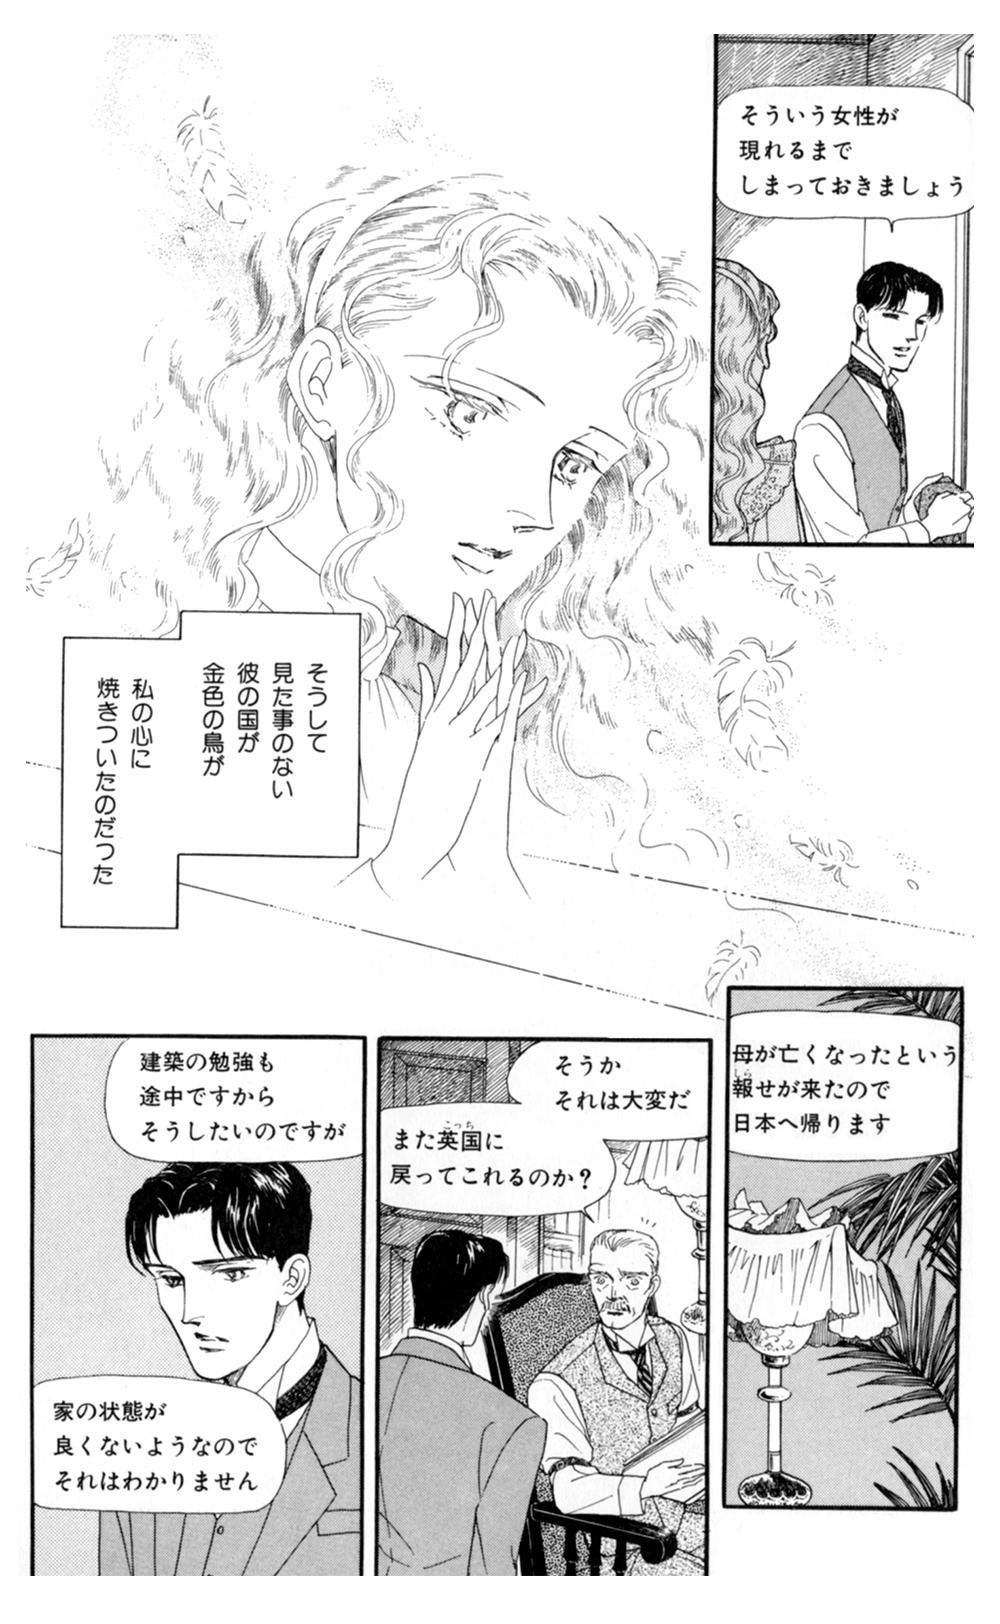 雨柳堂夢咄 第7話「金色の鶏」①uryudo-04-168.jpg